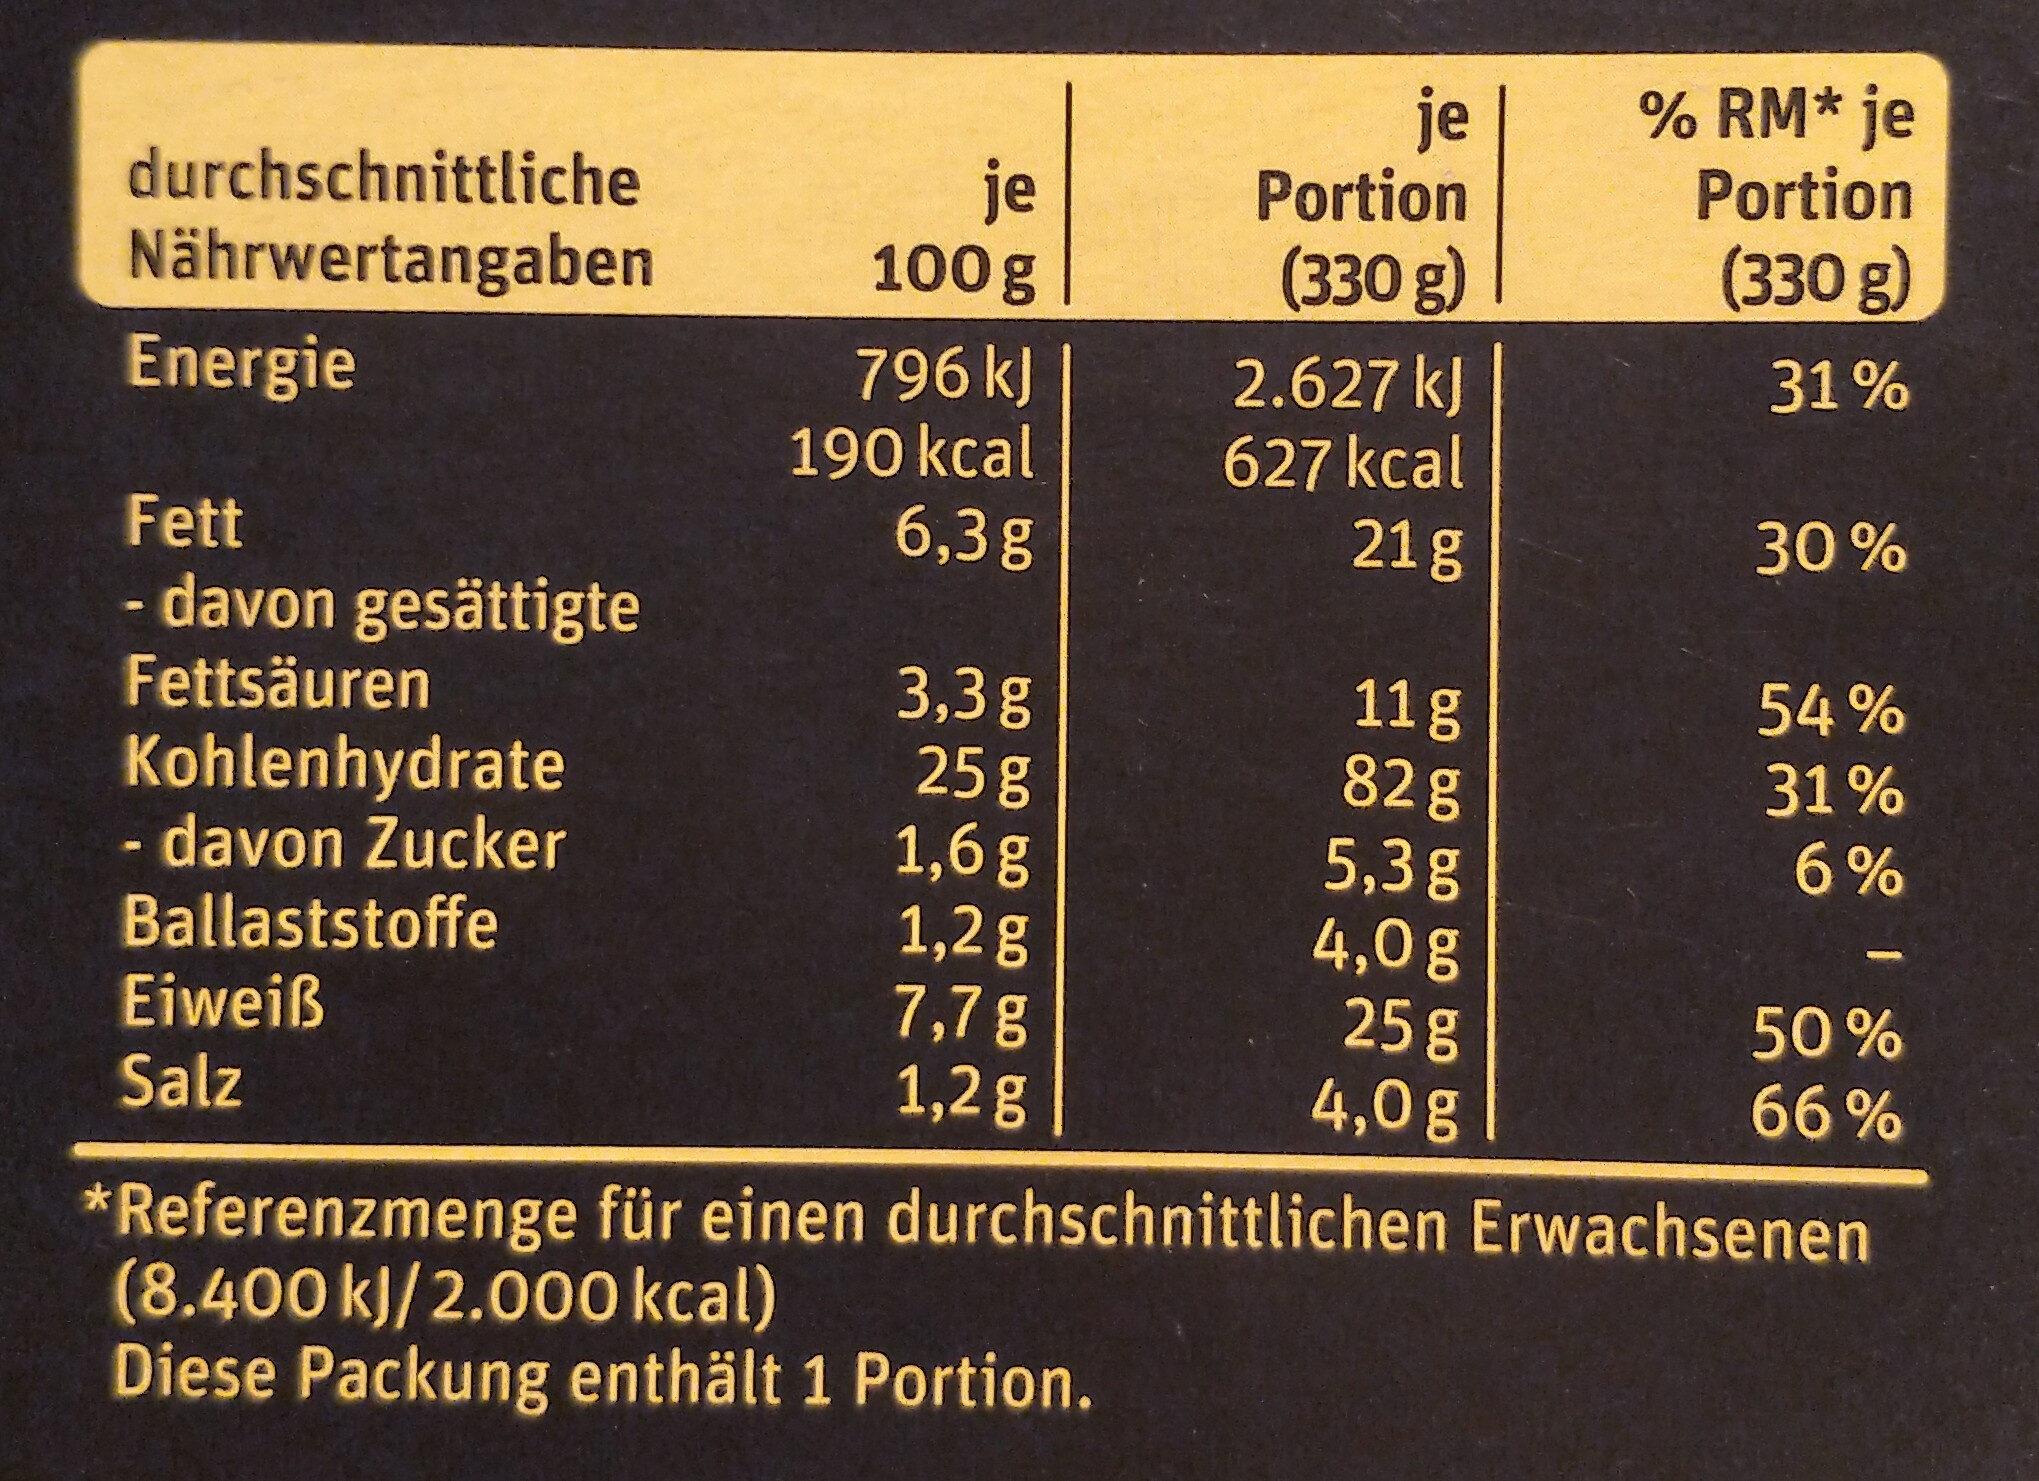 Manufaktur-Steinofenpizza Bufala - Nutrition facts